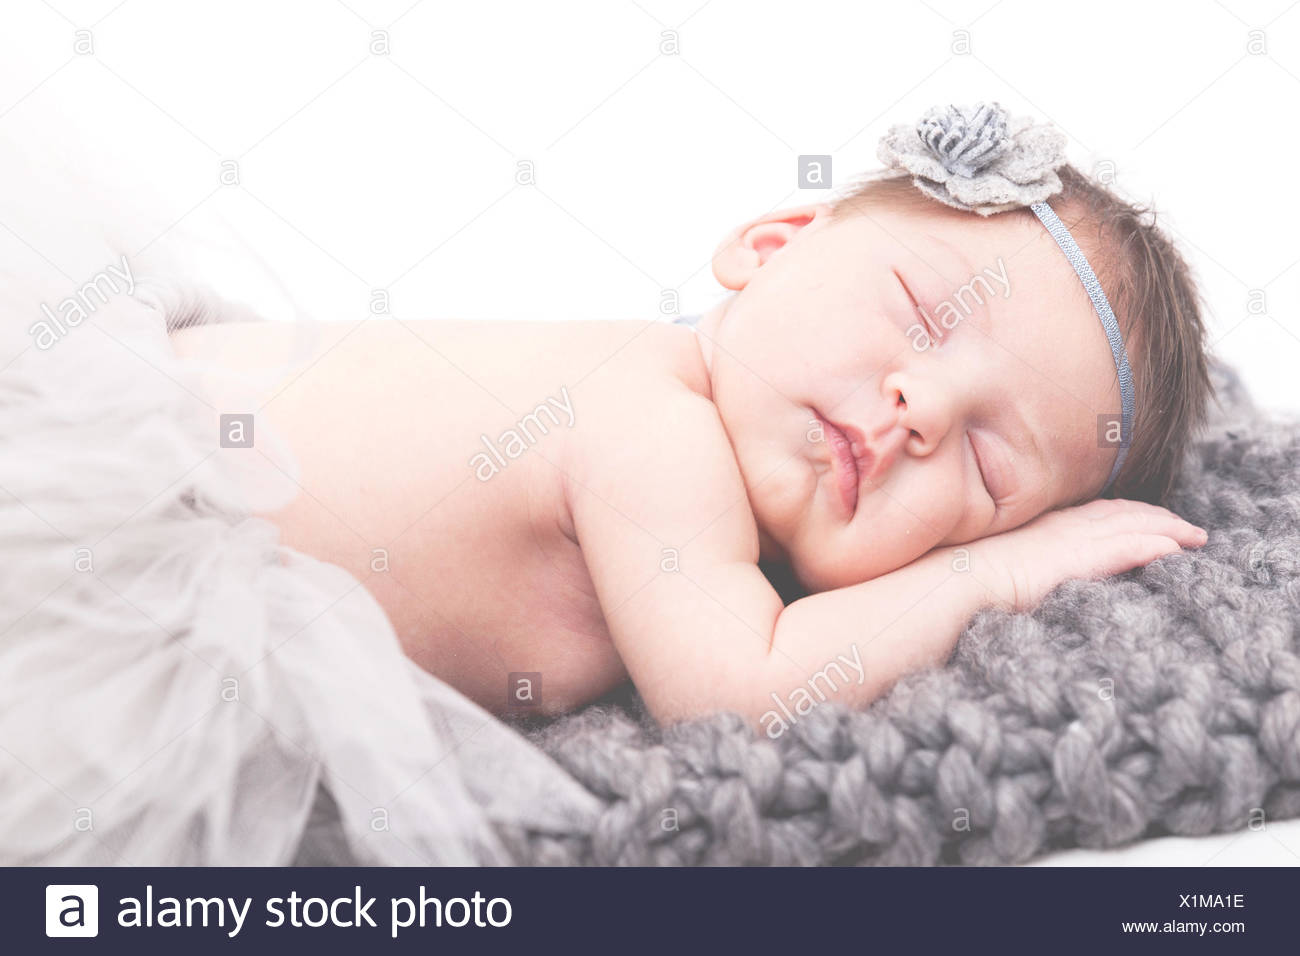 Portrait of a newborn baby girl sleeping on blanket - Stock Image